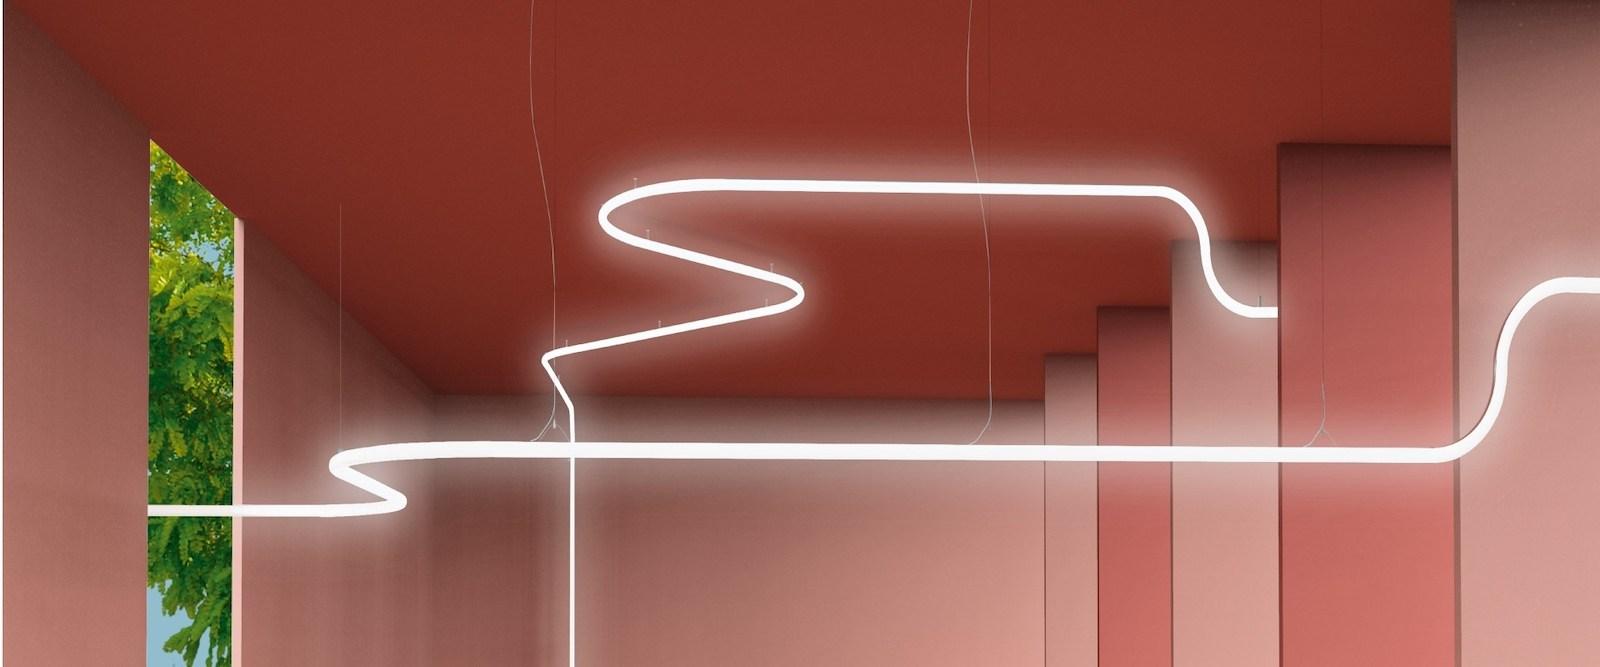 BIG Alphabet of Light: In leuchtenden Lettern